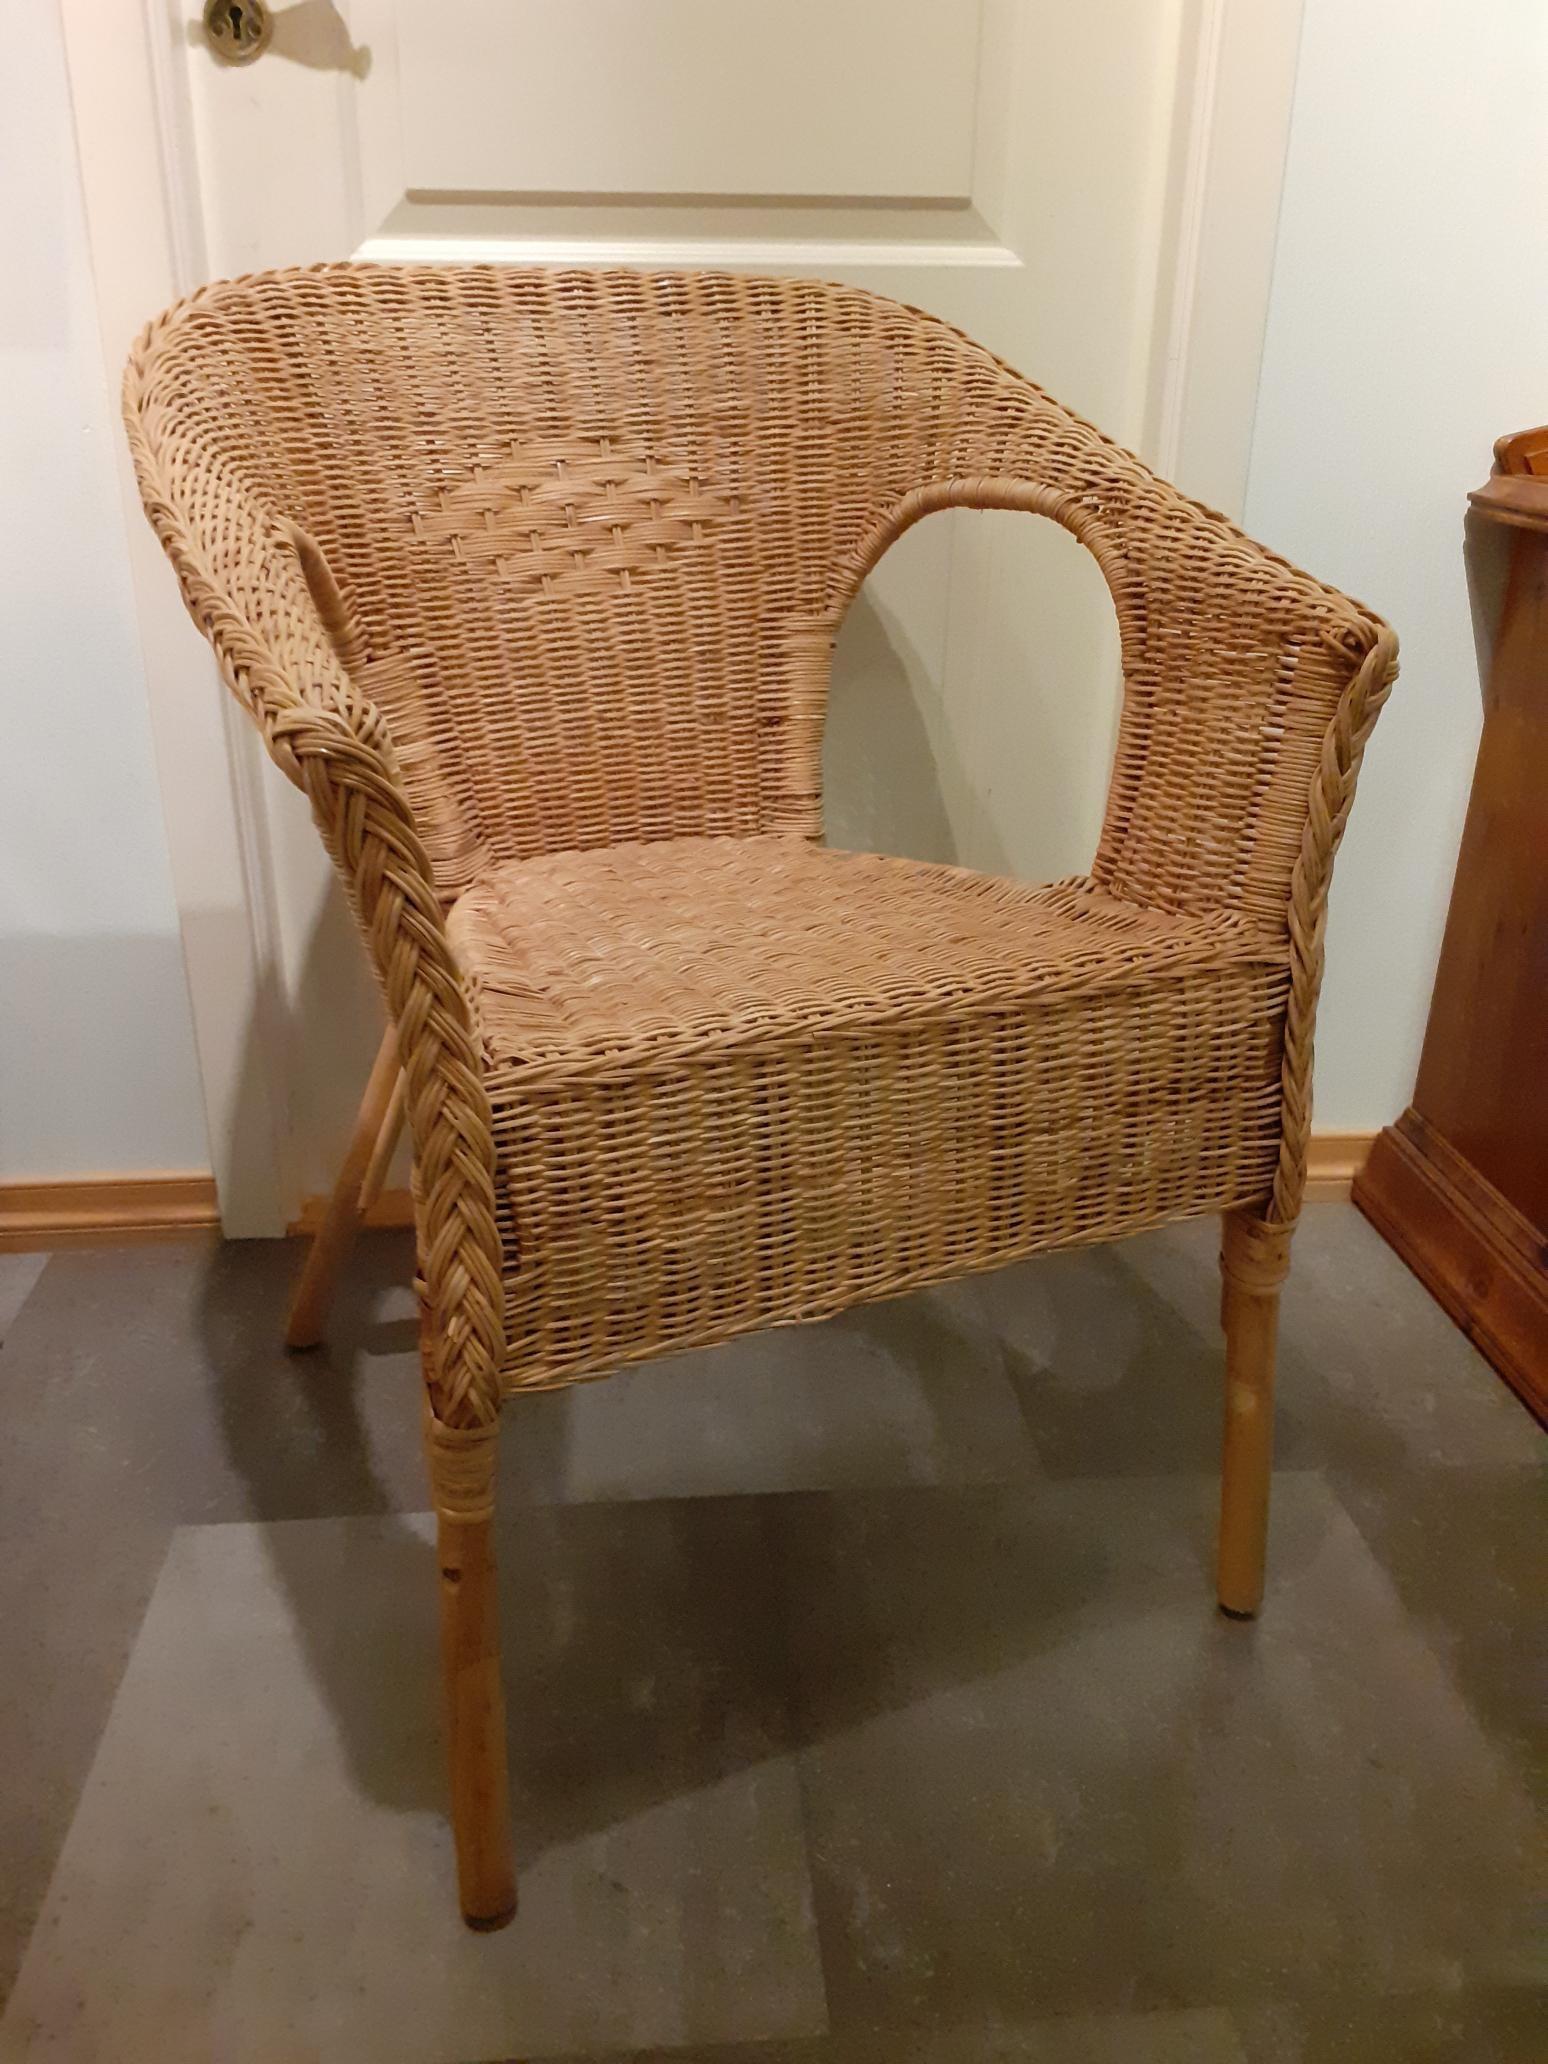 Fin Ikea Agen kurvstol i bambus mpute | FINN.no